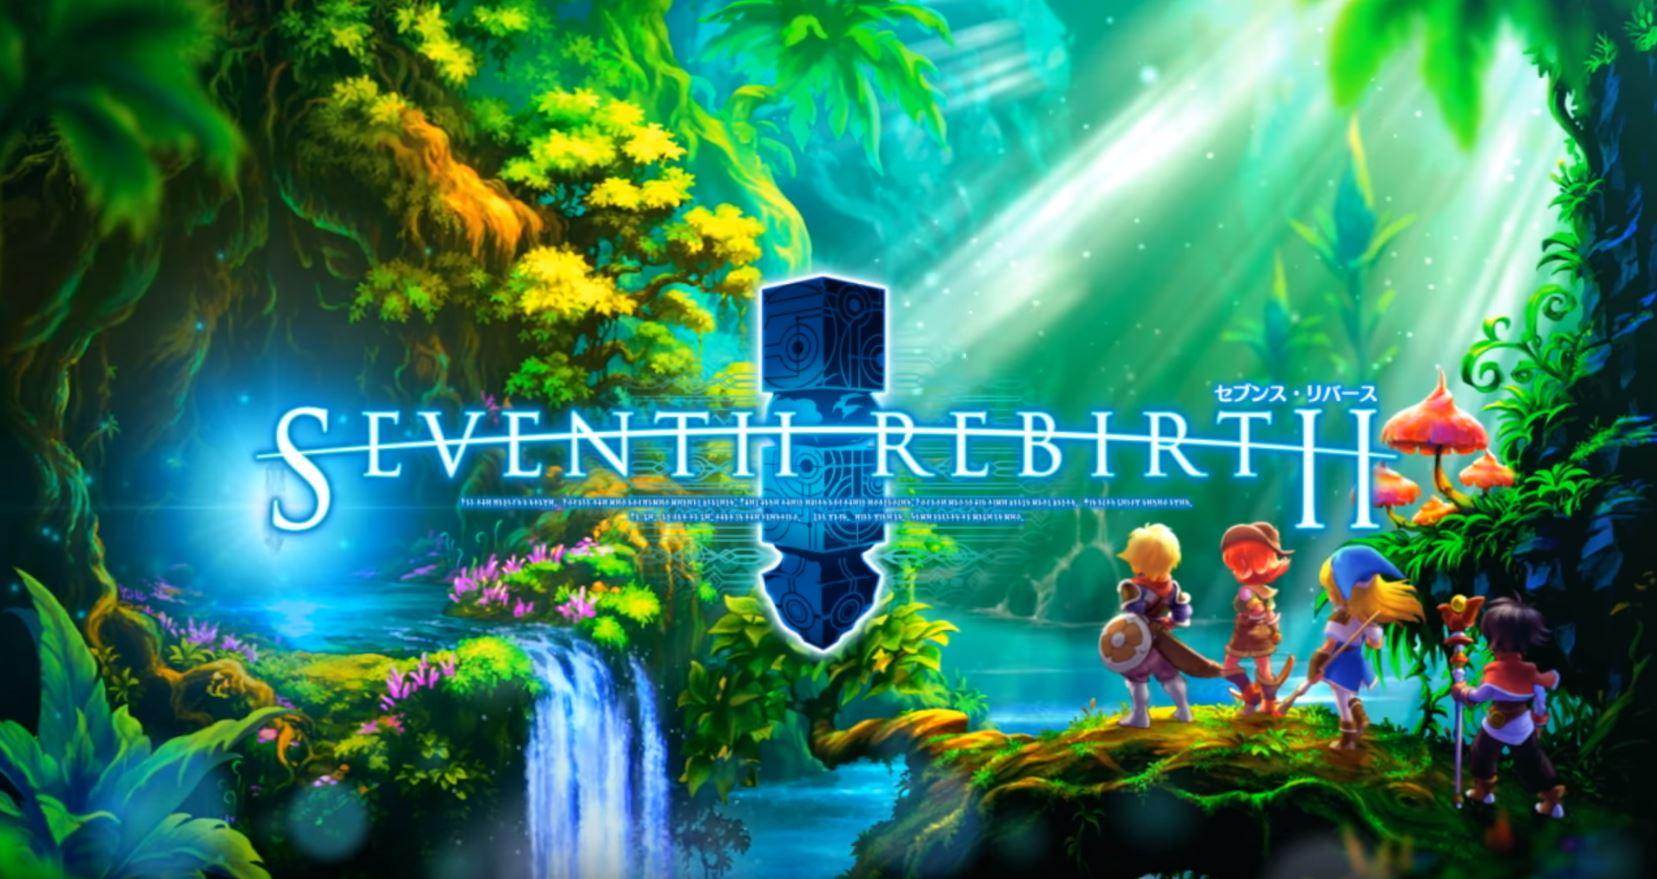 Seventh Rebirth: Ex-Final-Fantasy-XIV-Producer arbeitet an Mobile-MMORPG